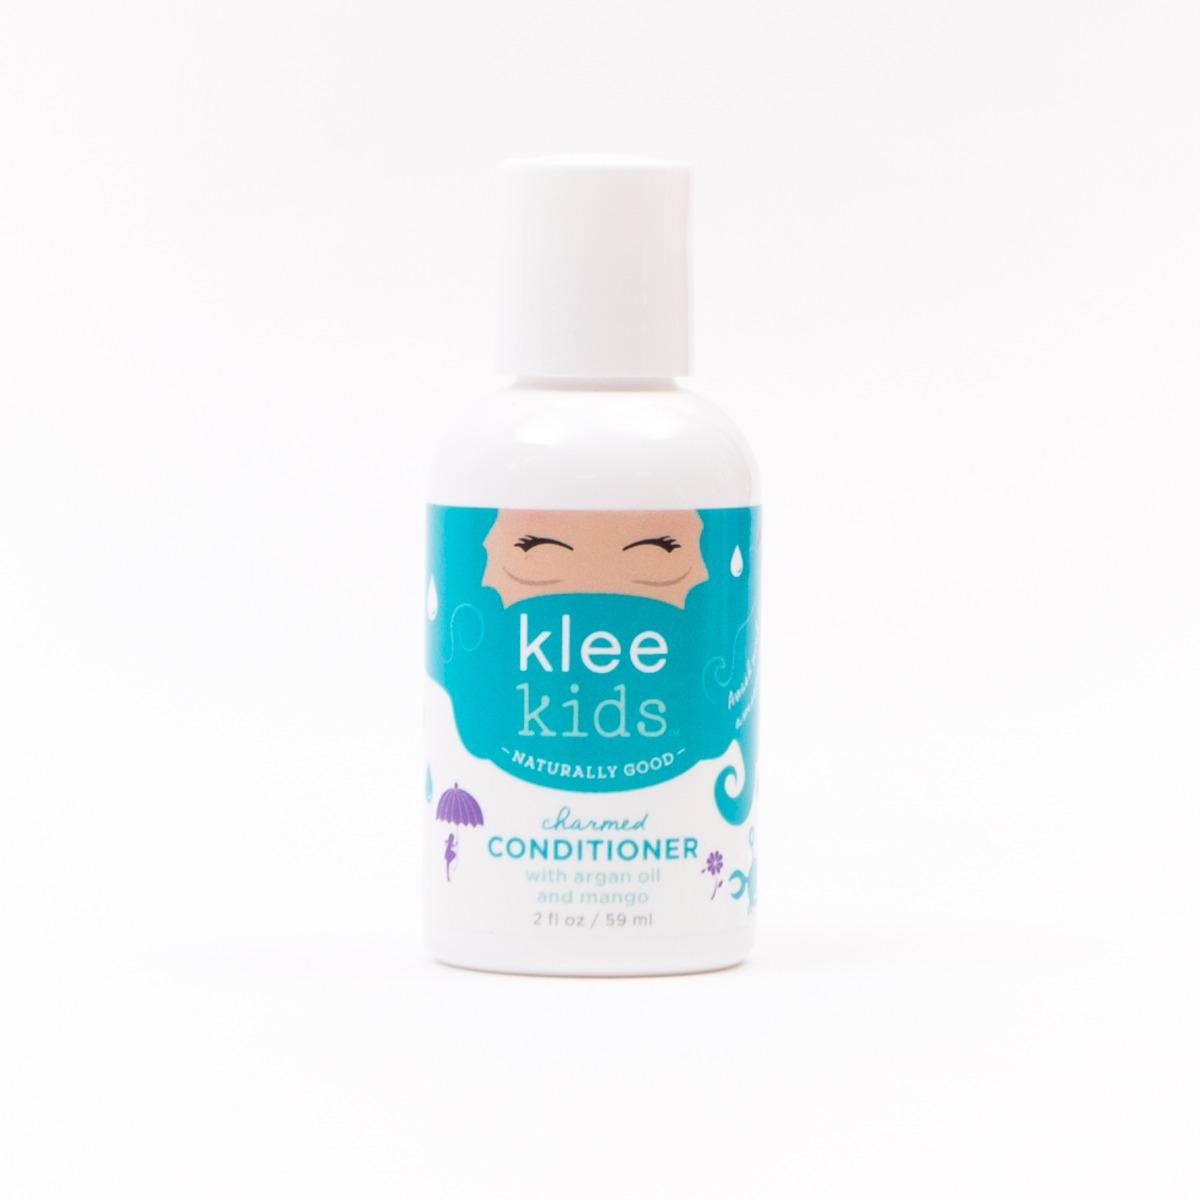 Klee Naturals Organic Conditioner